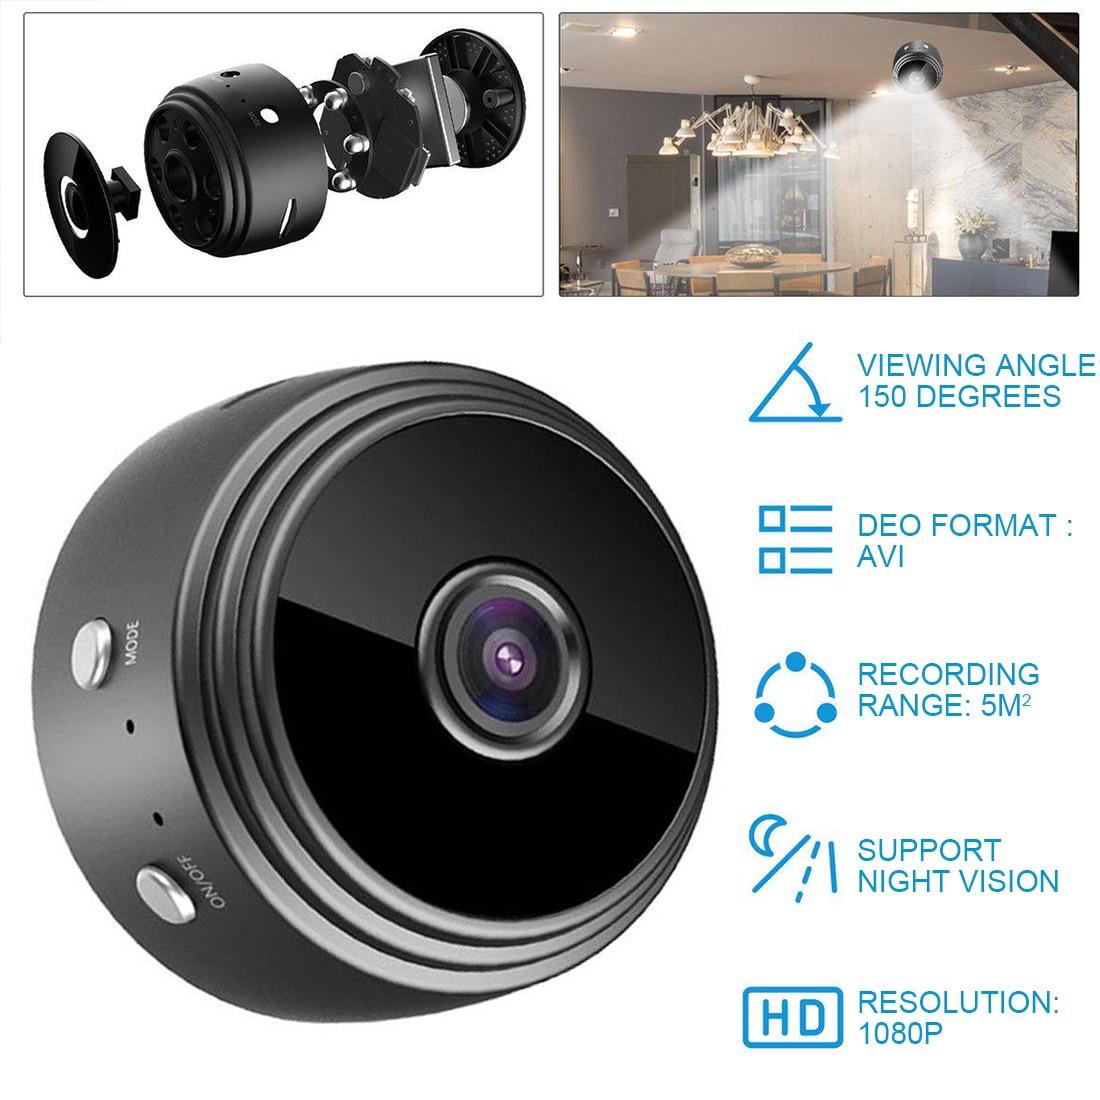 1080P Mini Wifi Camera A9 Wireless Camera Home Security Surveillance Camera Motion Detection IR Night Vision App Remote Monitor